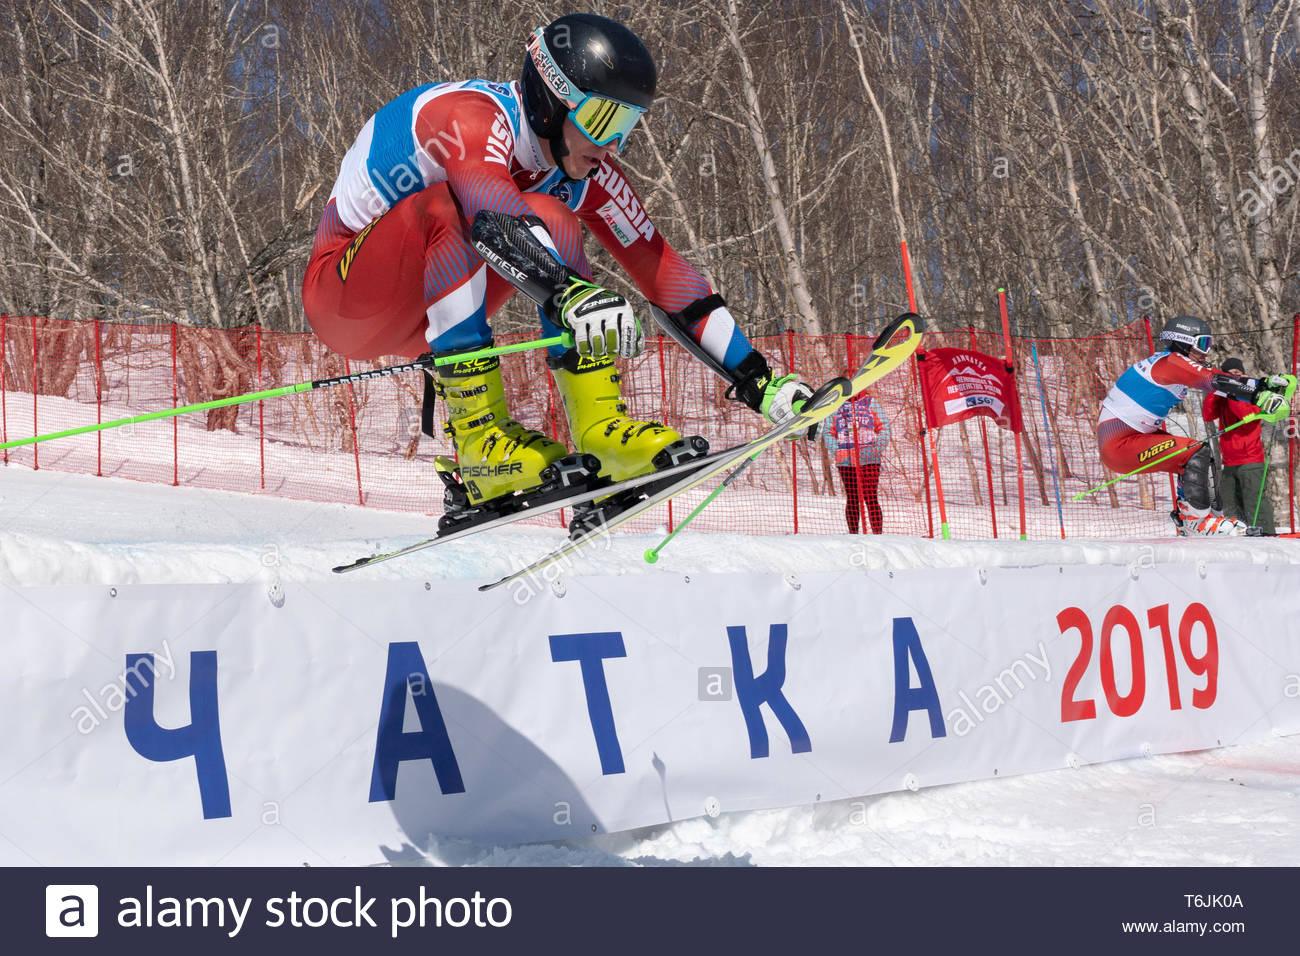 MOROZNAYA MOUNTAIN, KAMCHATKA, RUSSIA - MARCH 30, 2019: Mountain skier Alexey Ovchinnikov (Krasnoyarsk Region) skiing down mount slope. Russian Federa - Stock Image